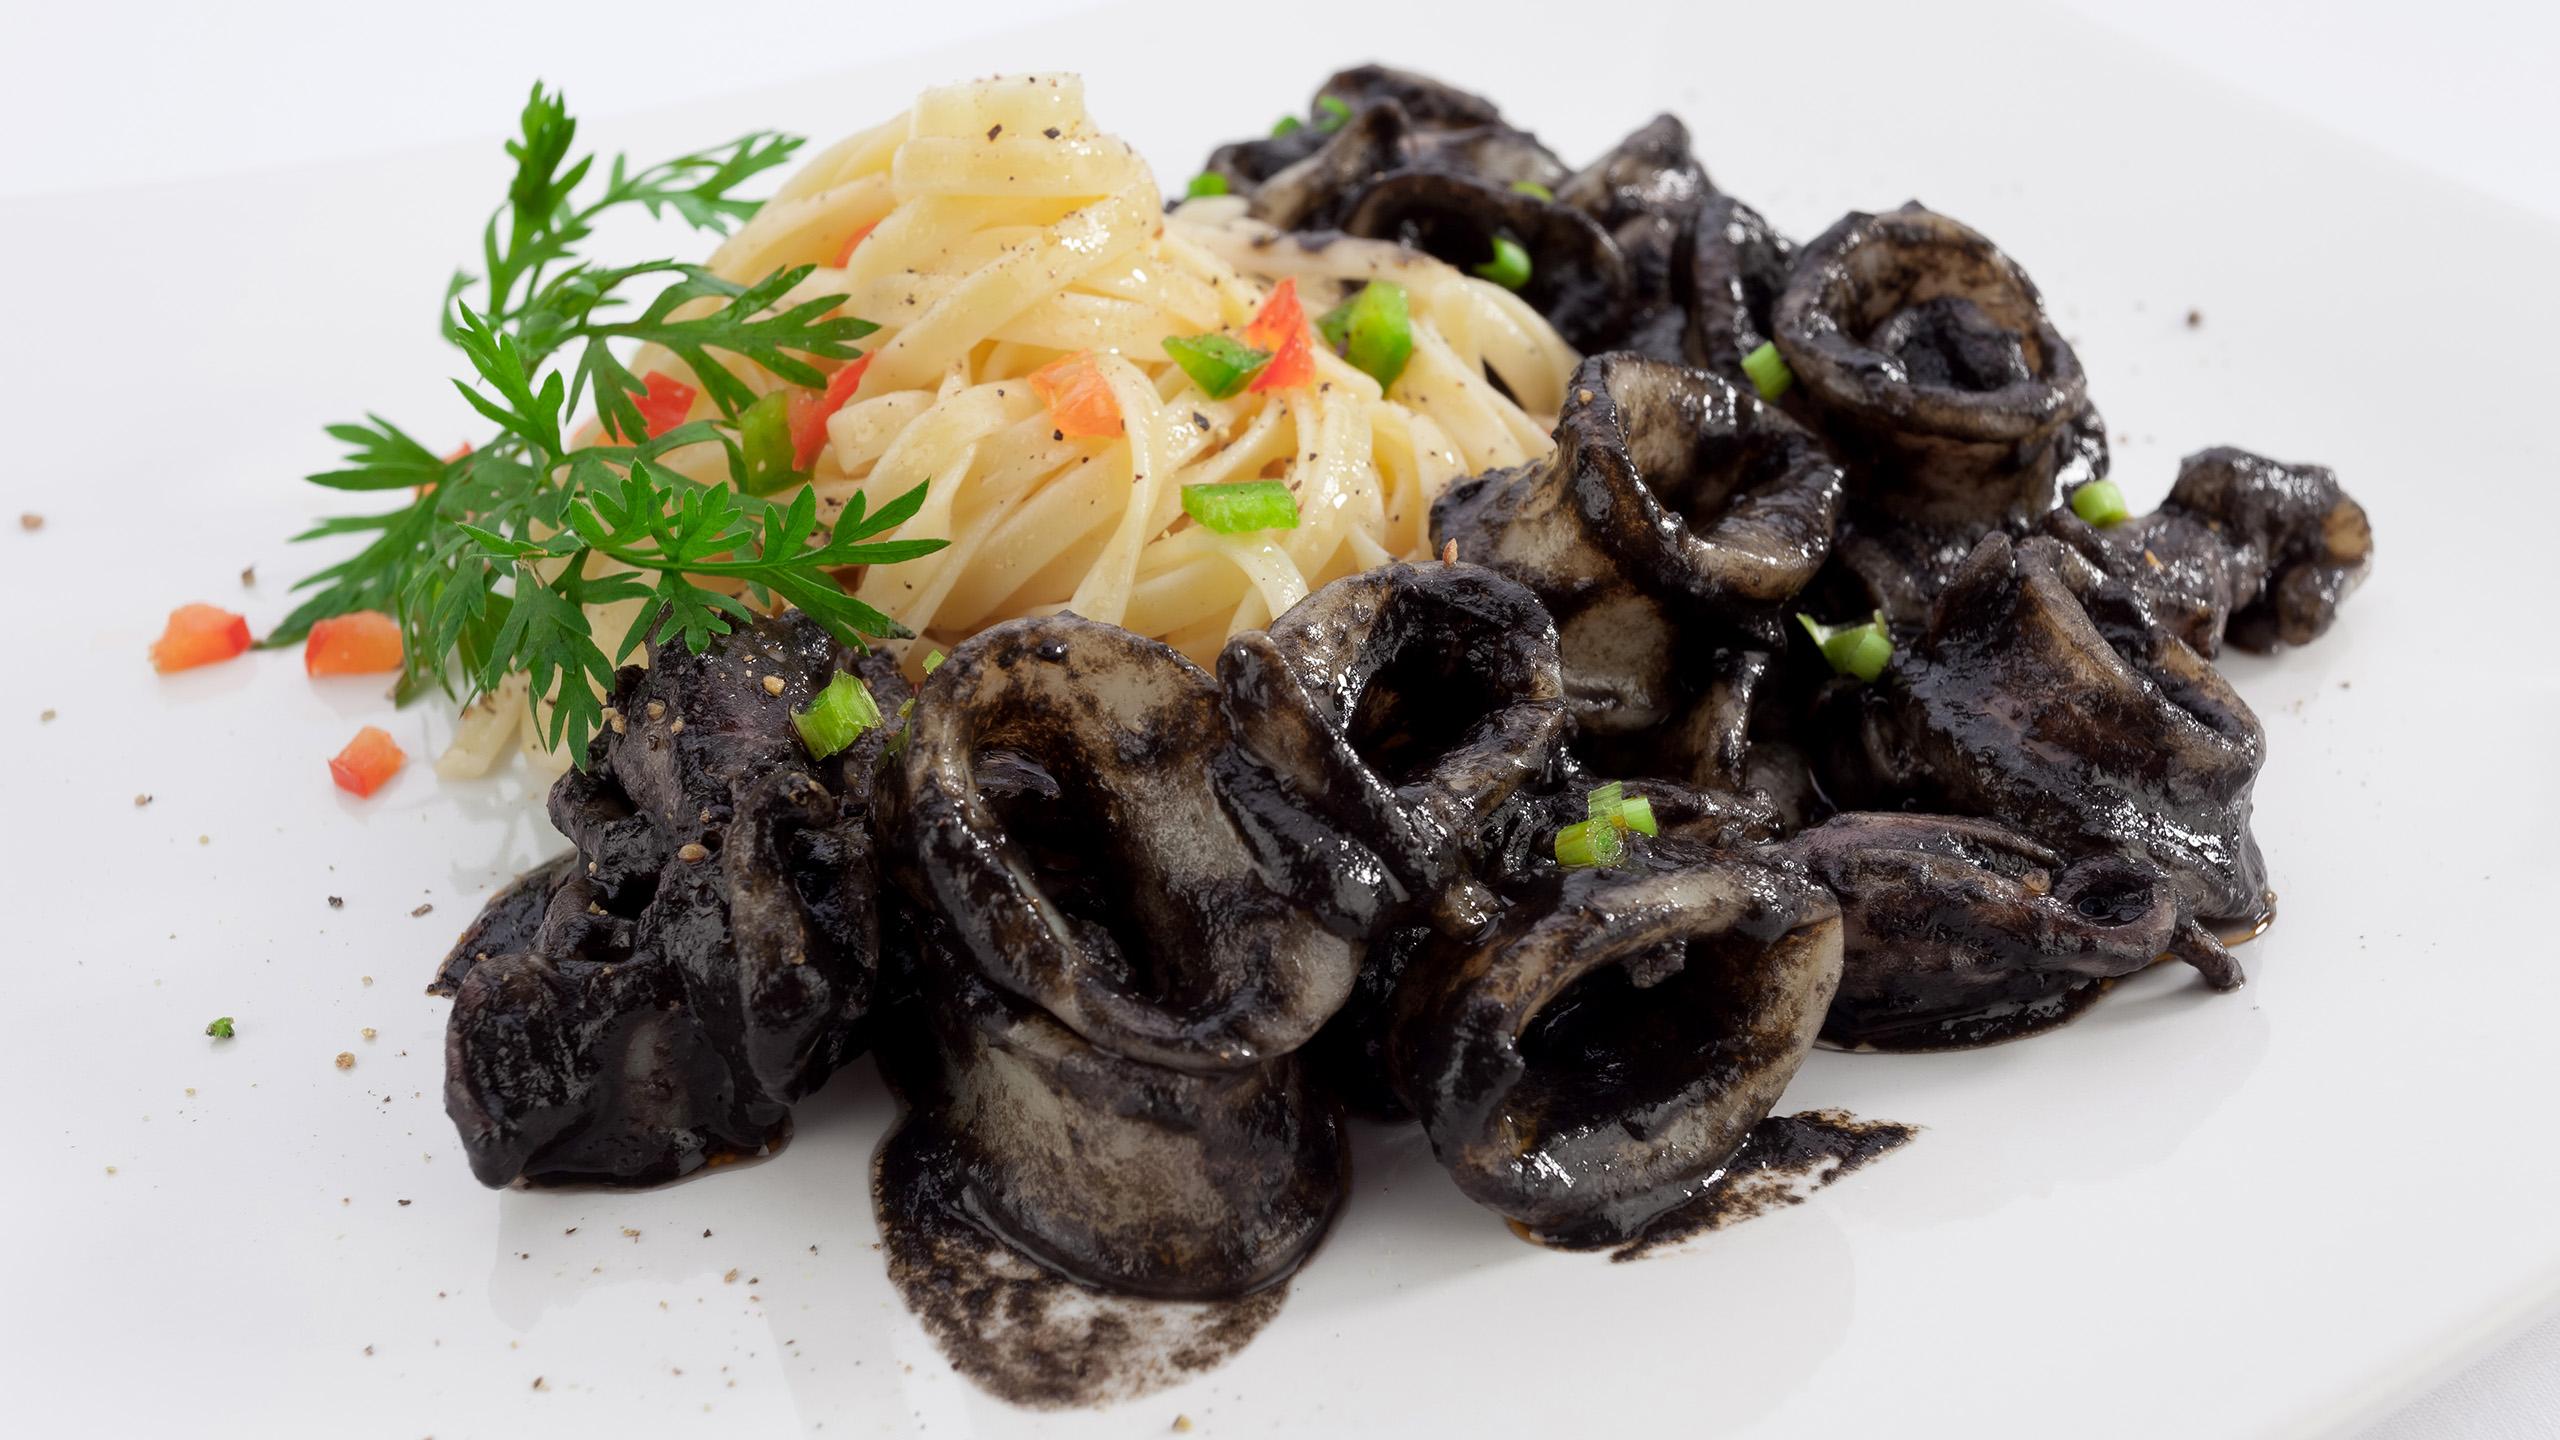 gastronomia 52 profand